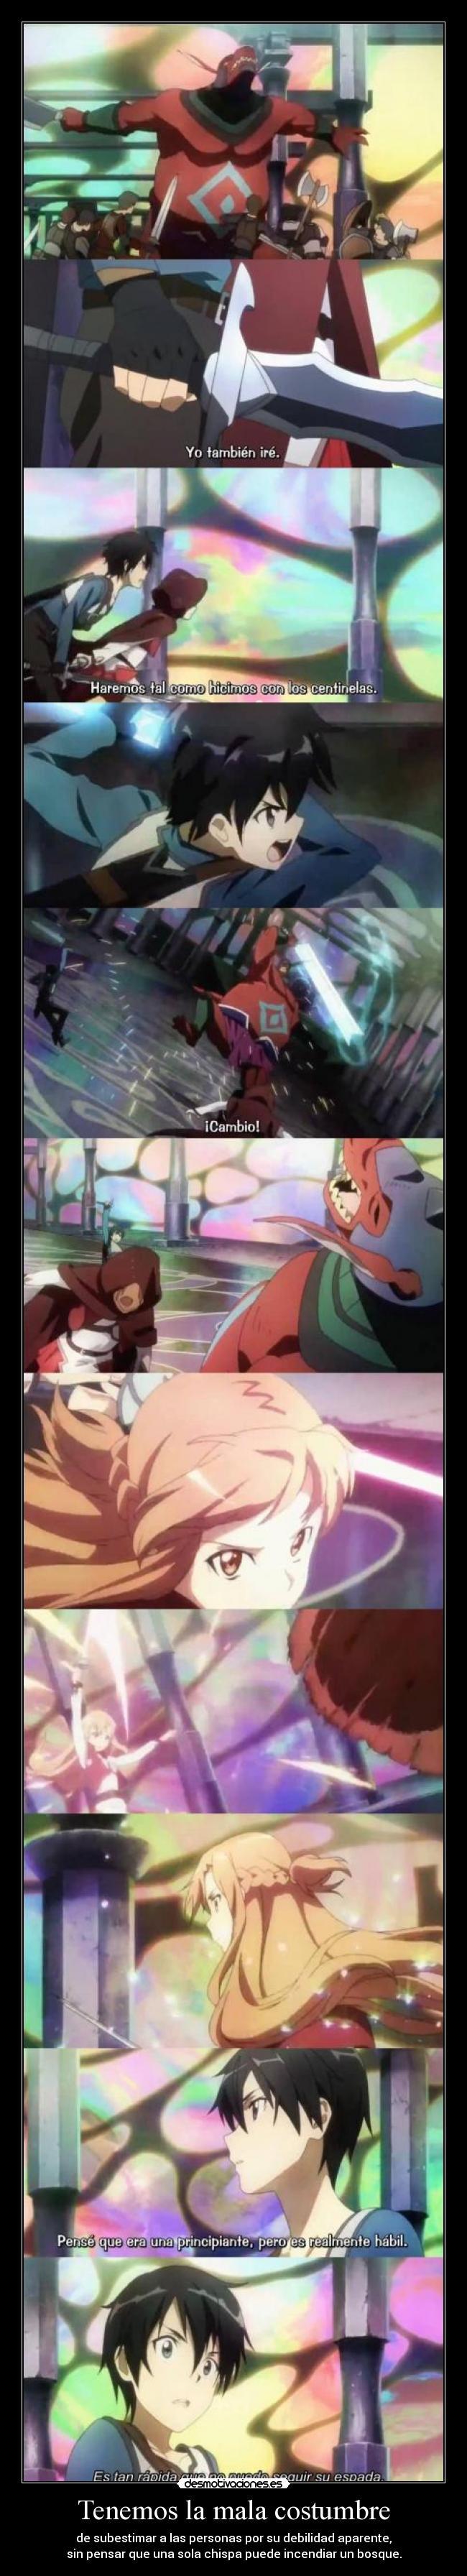 carteles asunayuuki comparacion interesante sworldartonline sao kirito asuna anime waltk desmotivaciones